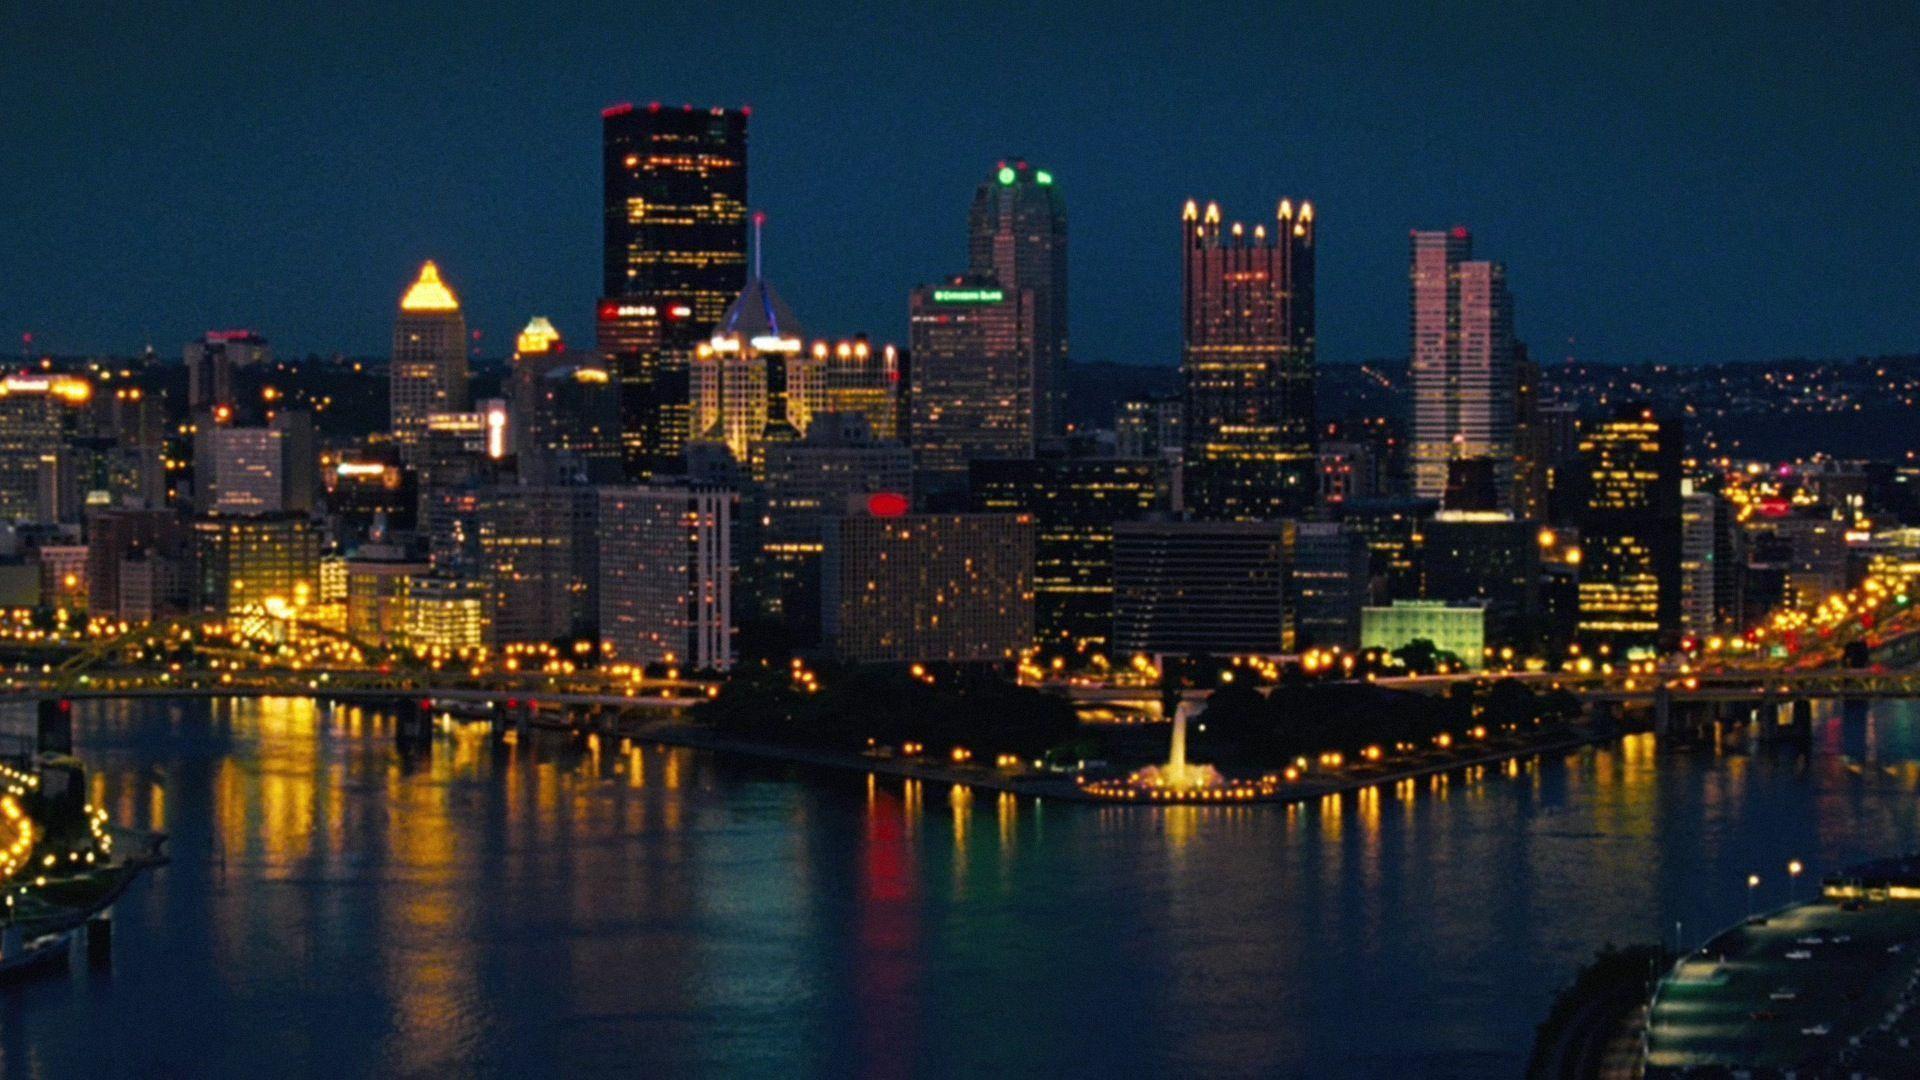 Pittsburgh Desktop Wallpaper Skyline: Dreamworks Wallpapers